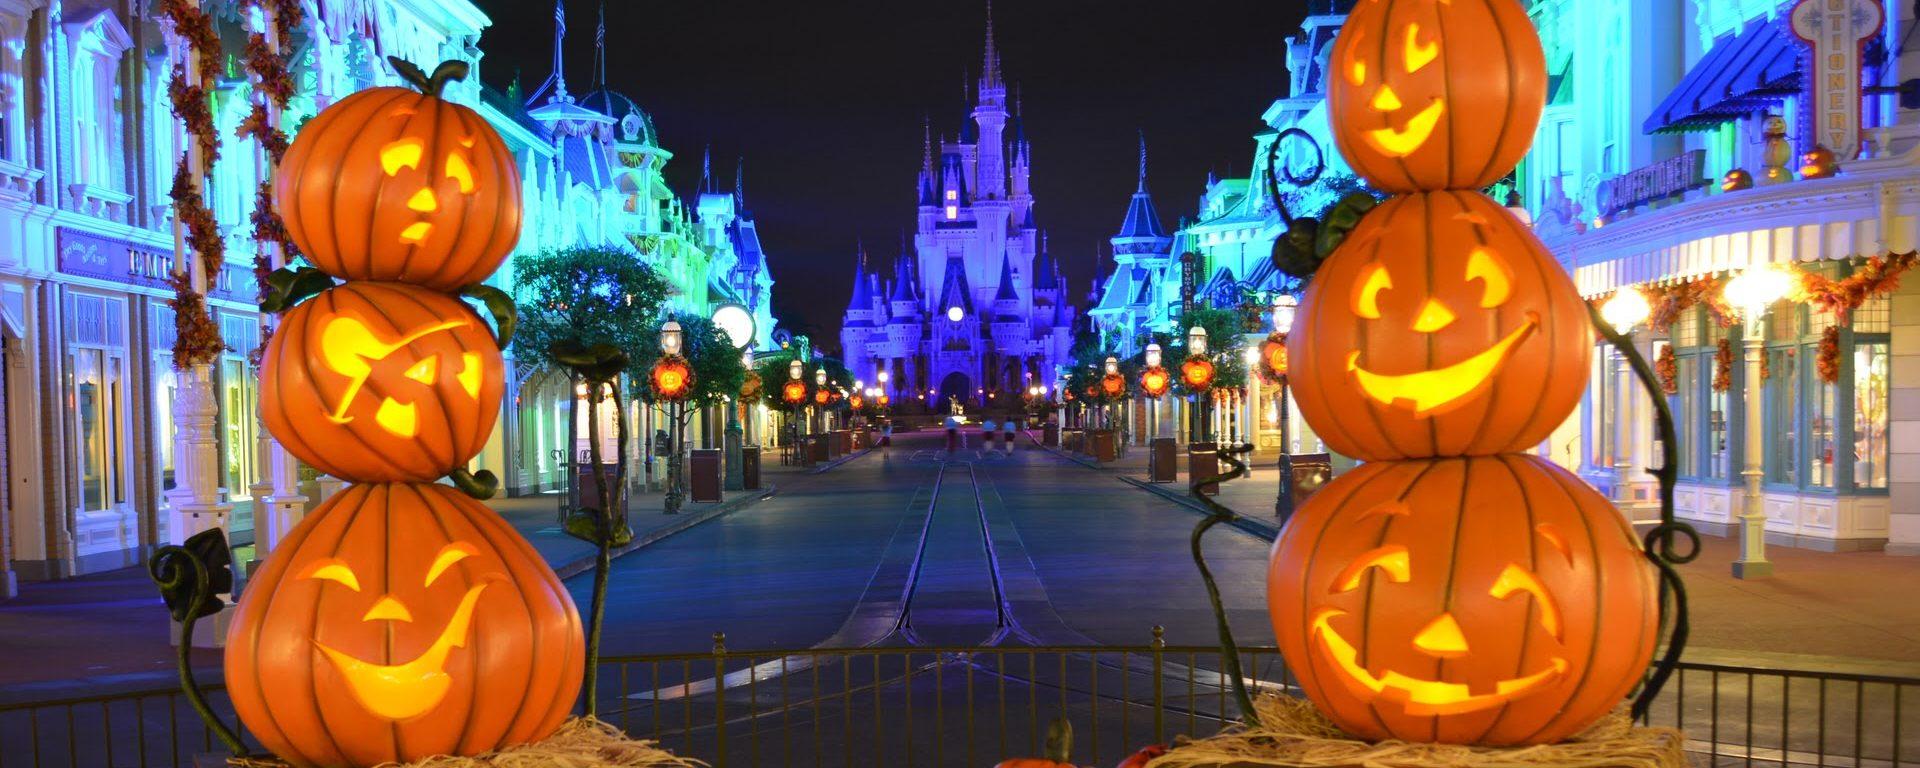 Festa de Halloween em Magic Kingdom